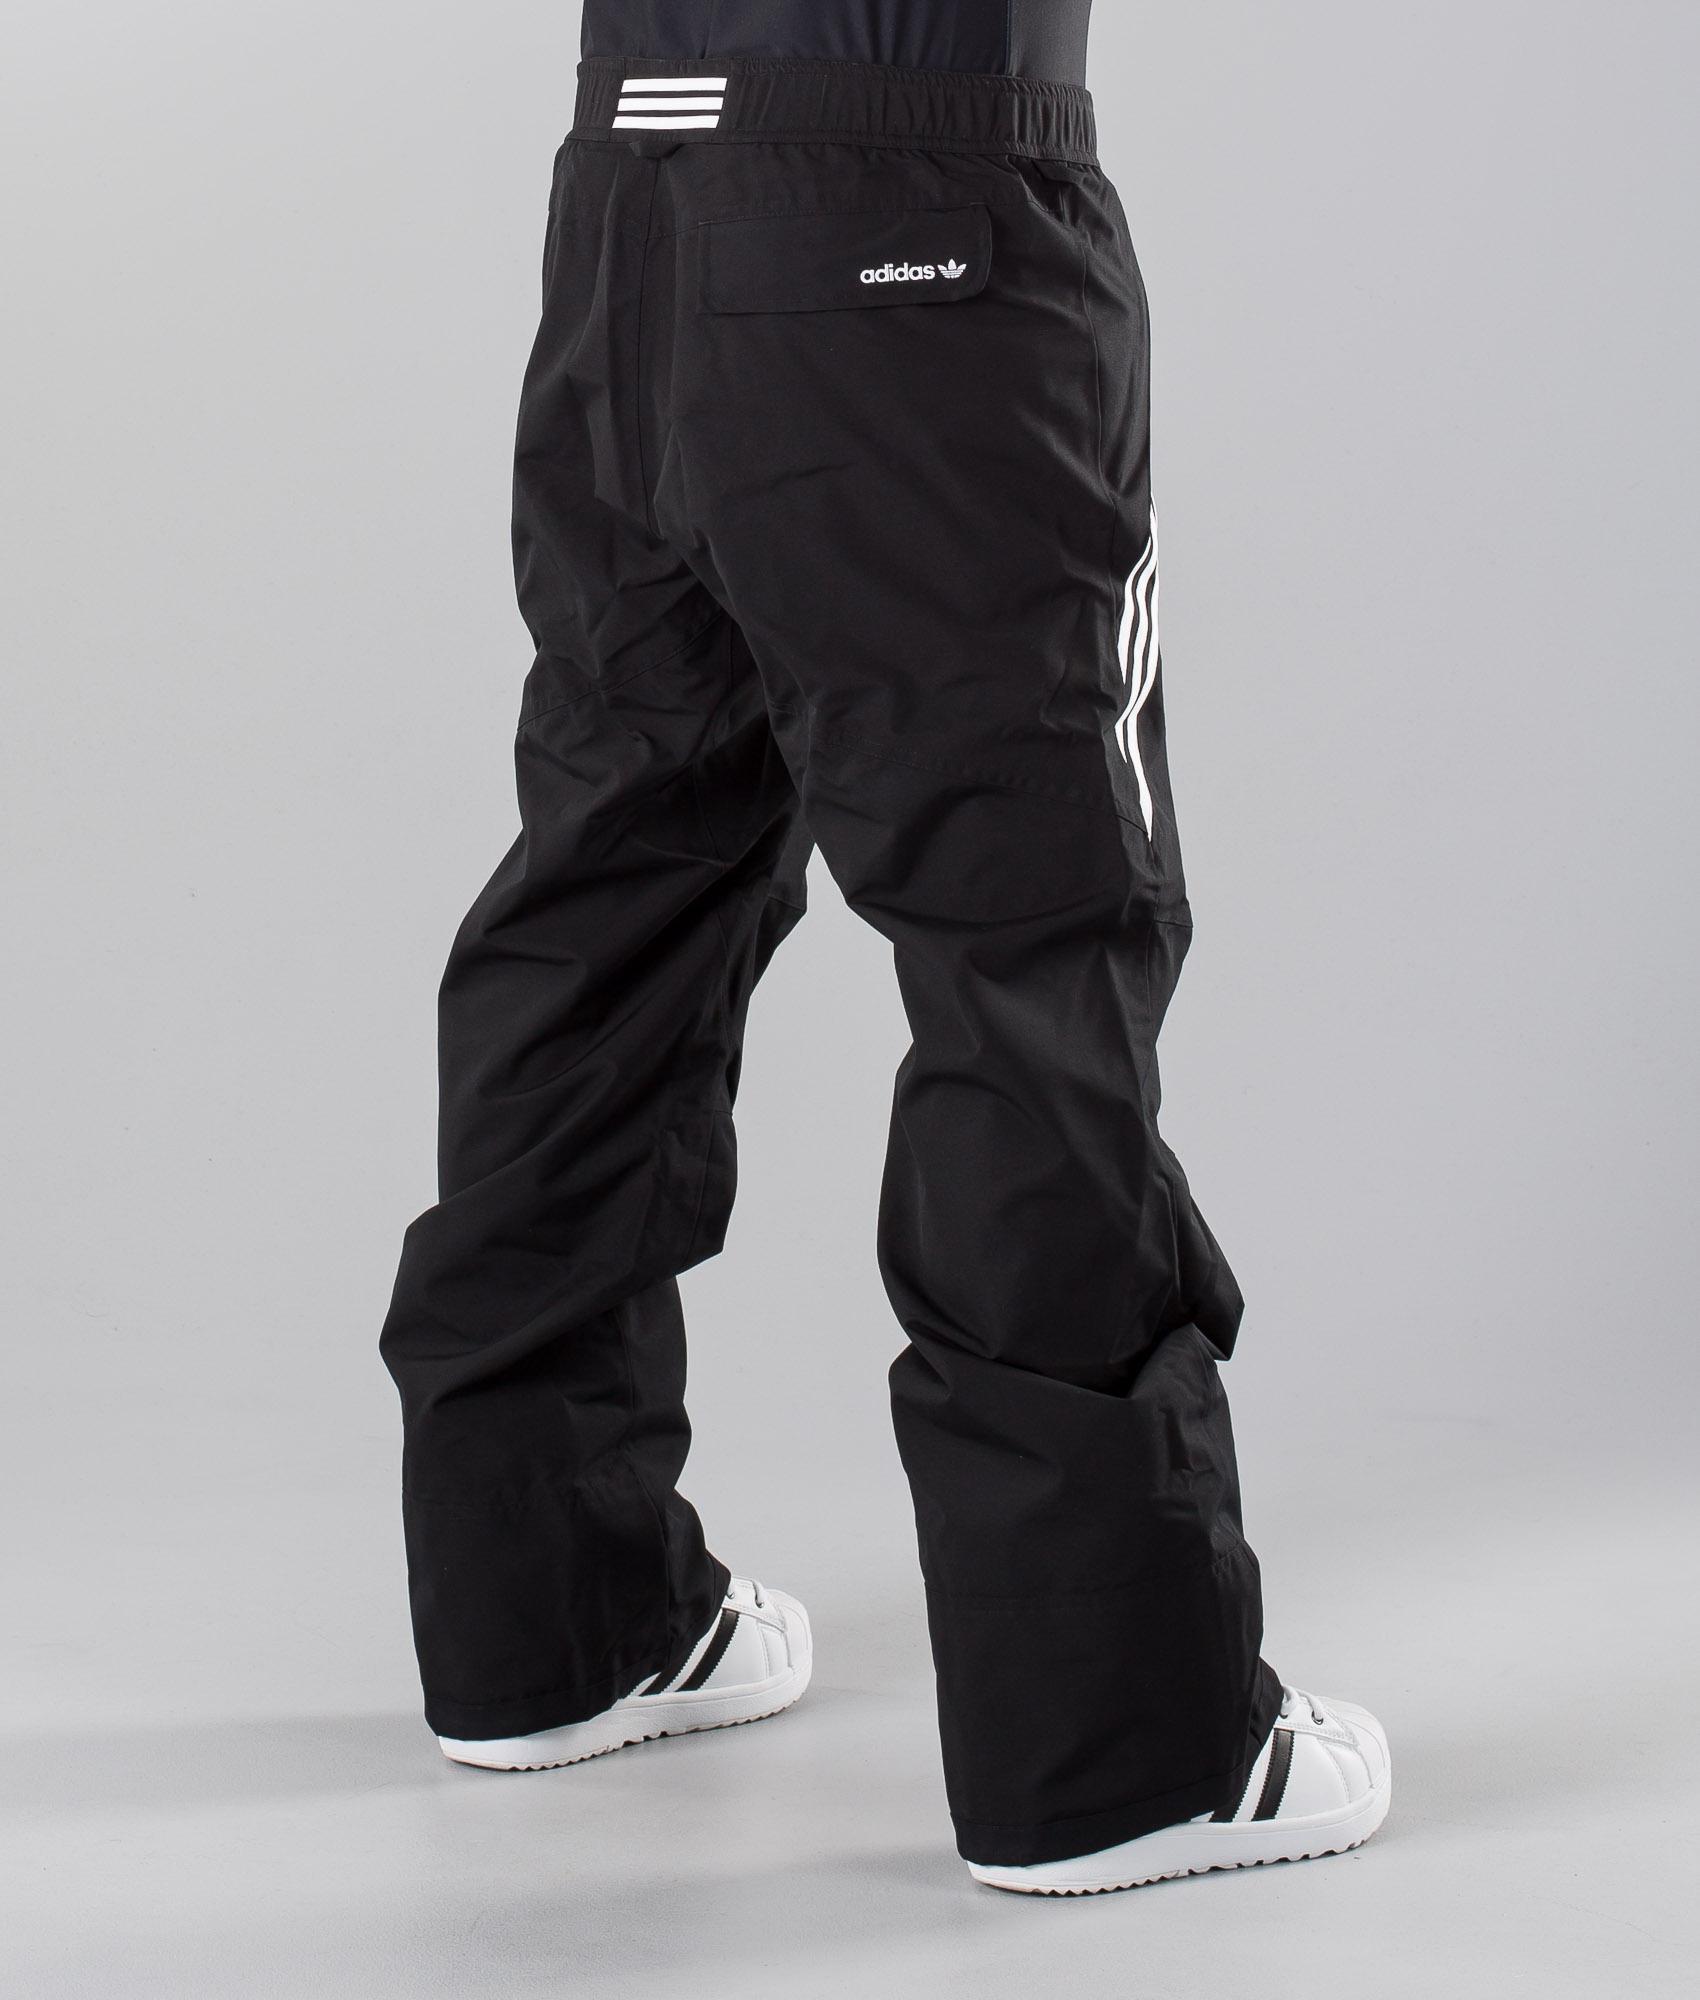 Adidas Snowboarding Riding Pant Snow Pants BlackWhite